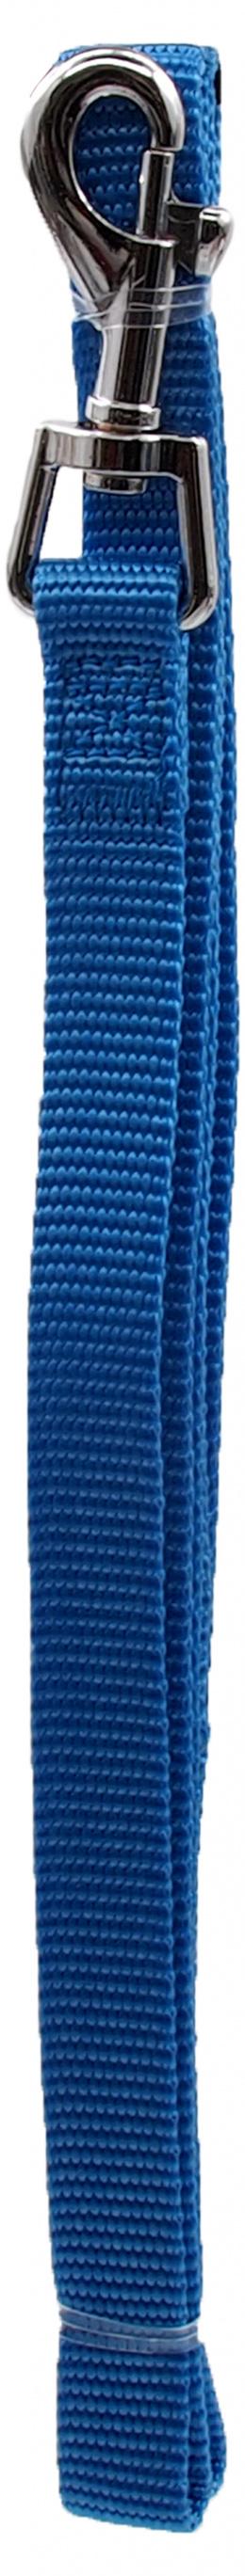 Поводок – Dog Fantasy Classic S, 15 мм, 120 см, цвет - синий